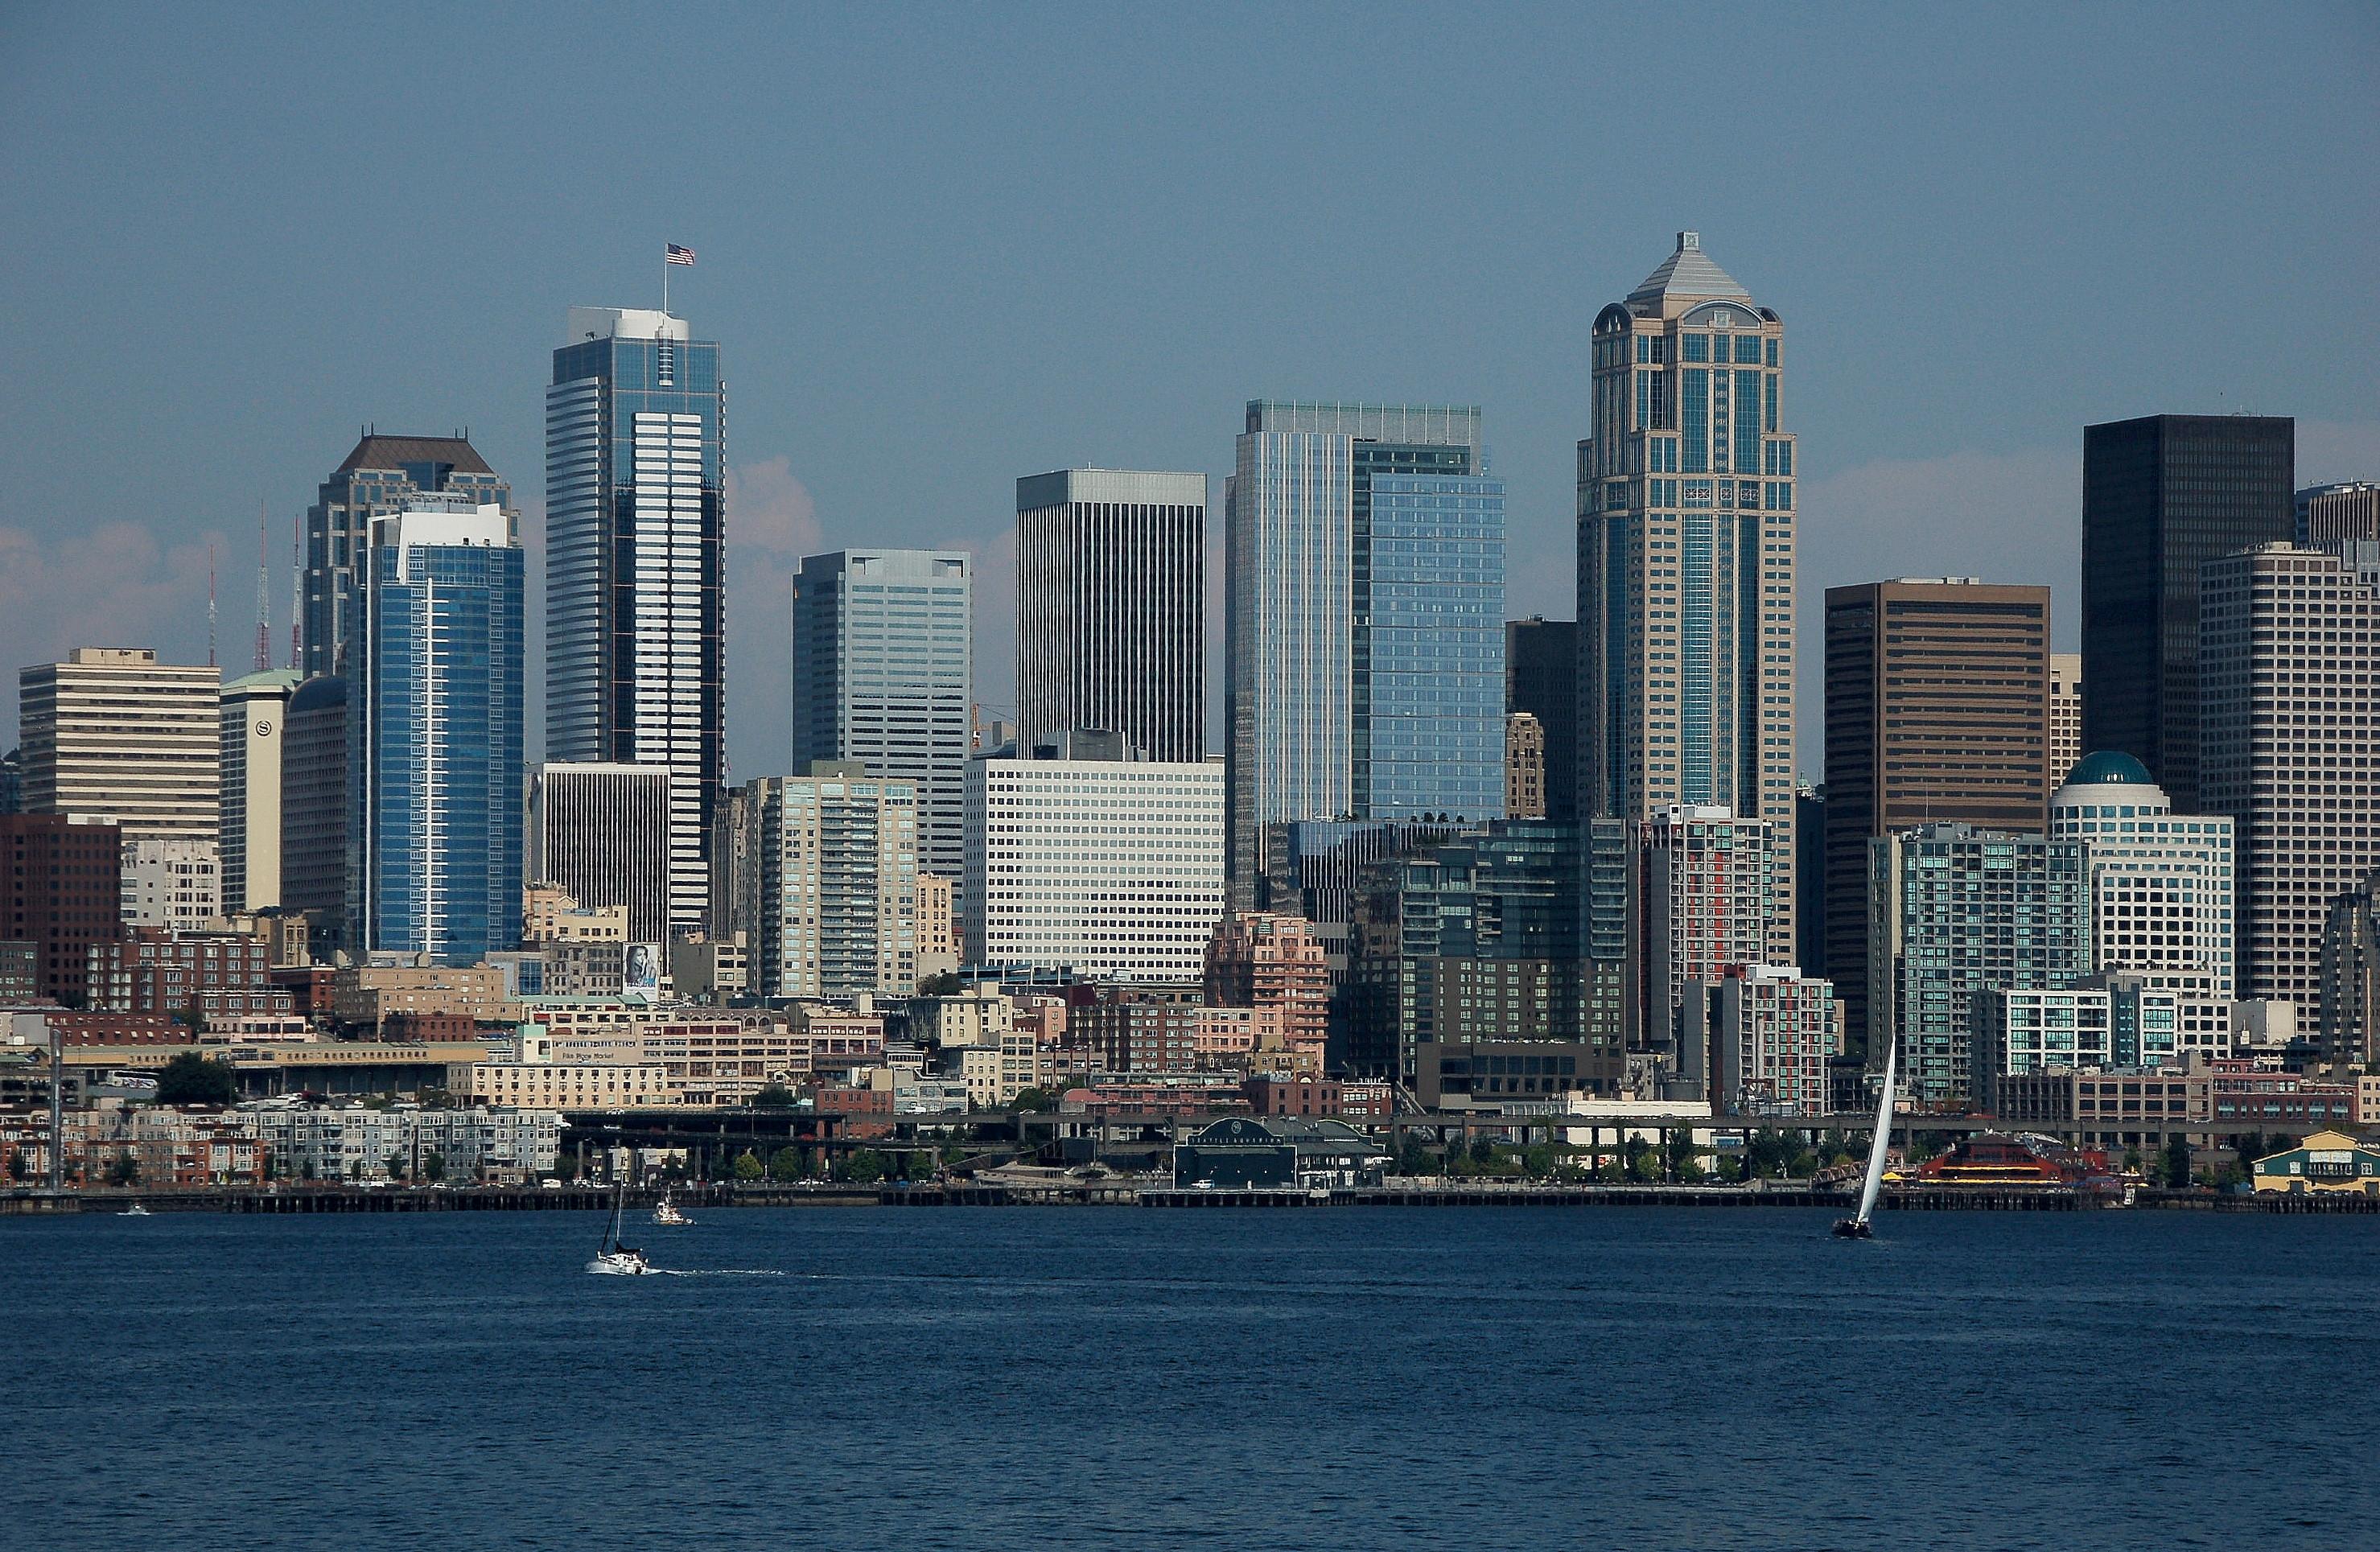 File:Seattle Washington Cityscape Photography.jpg - Wikimedia Commons